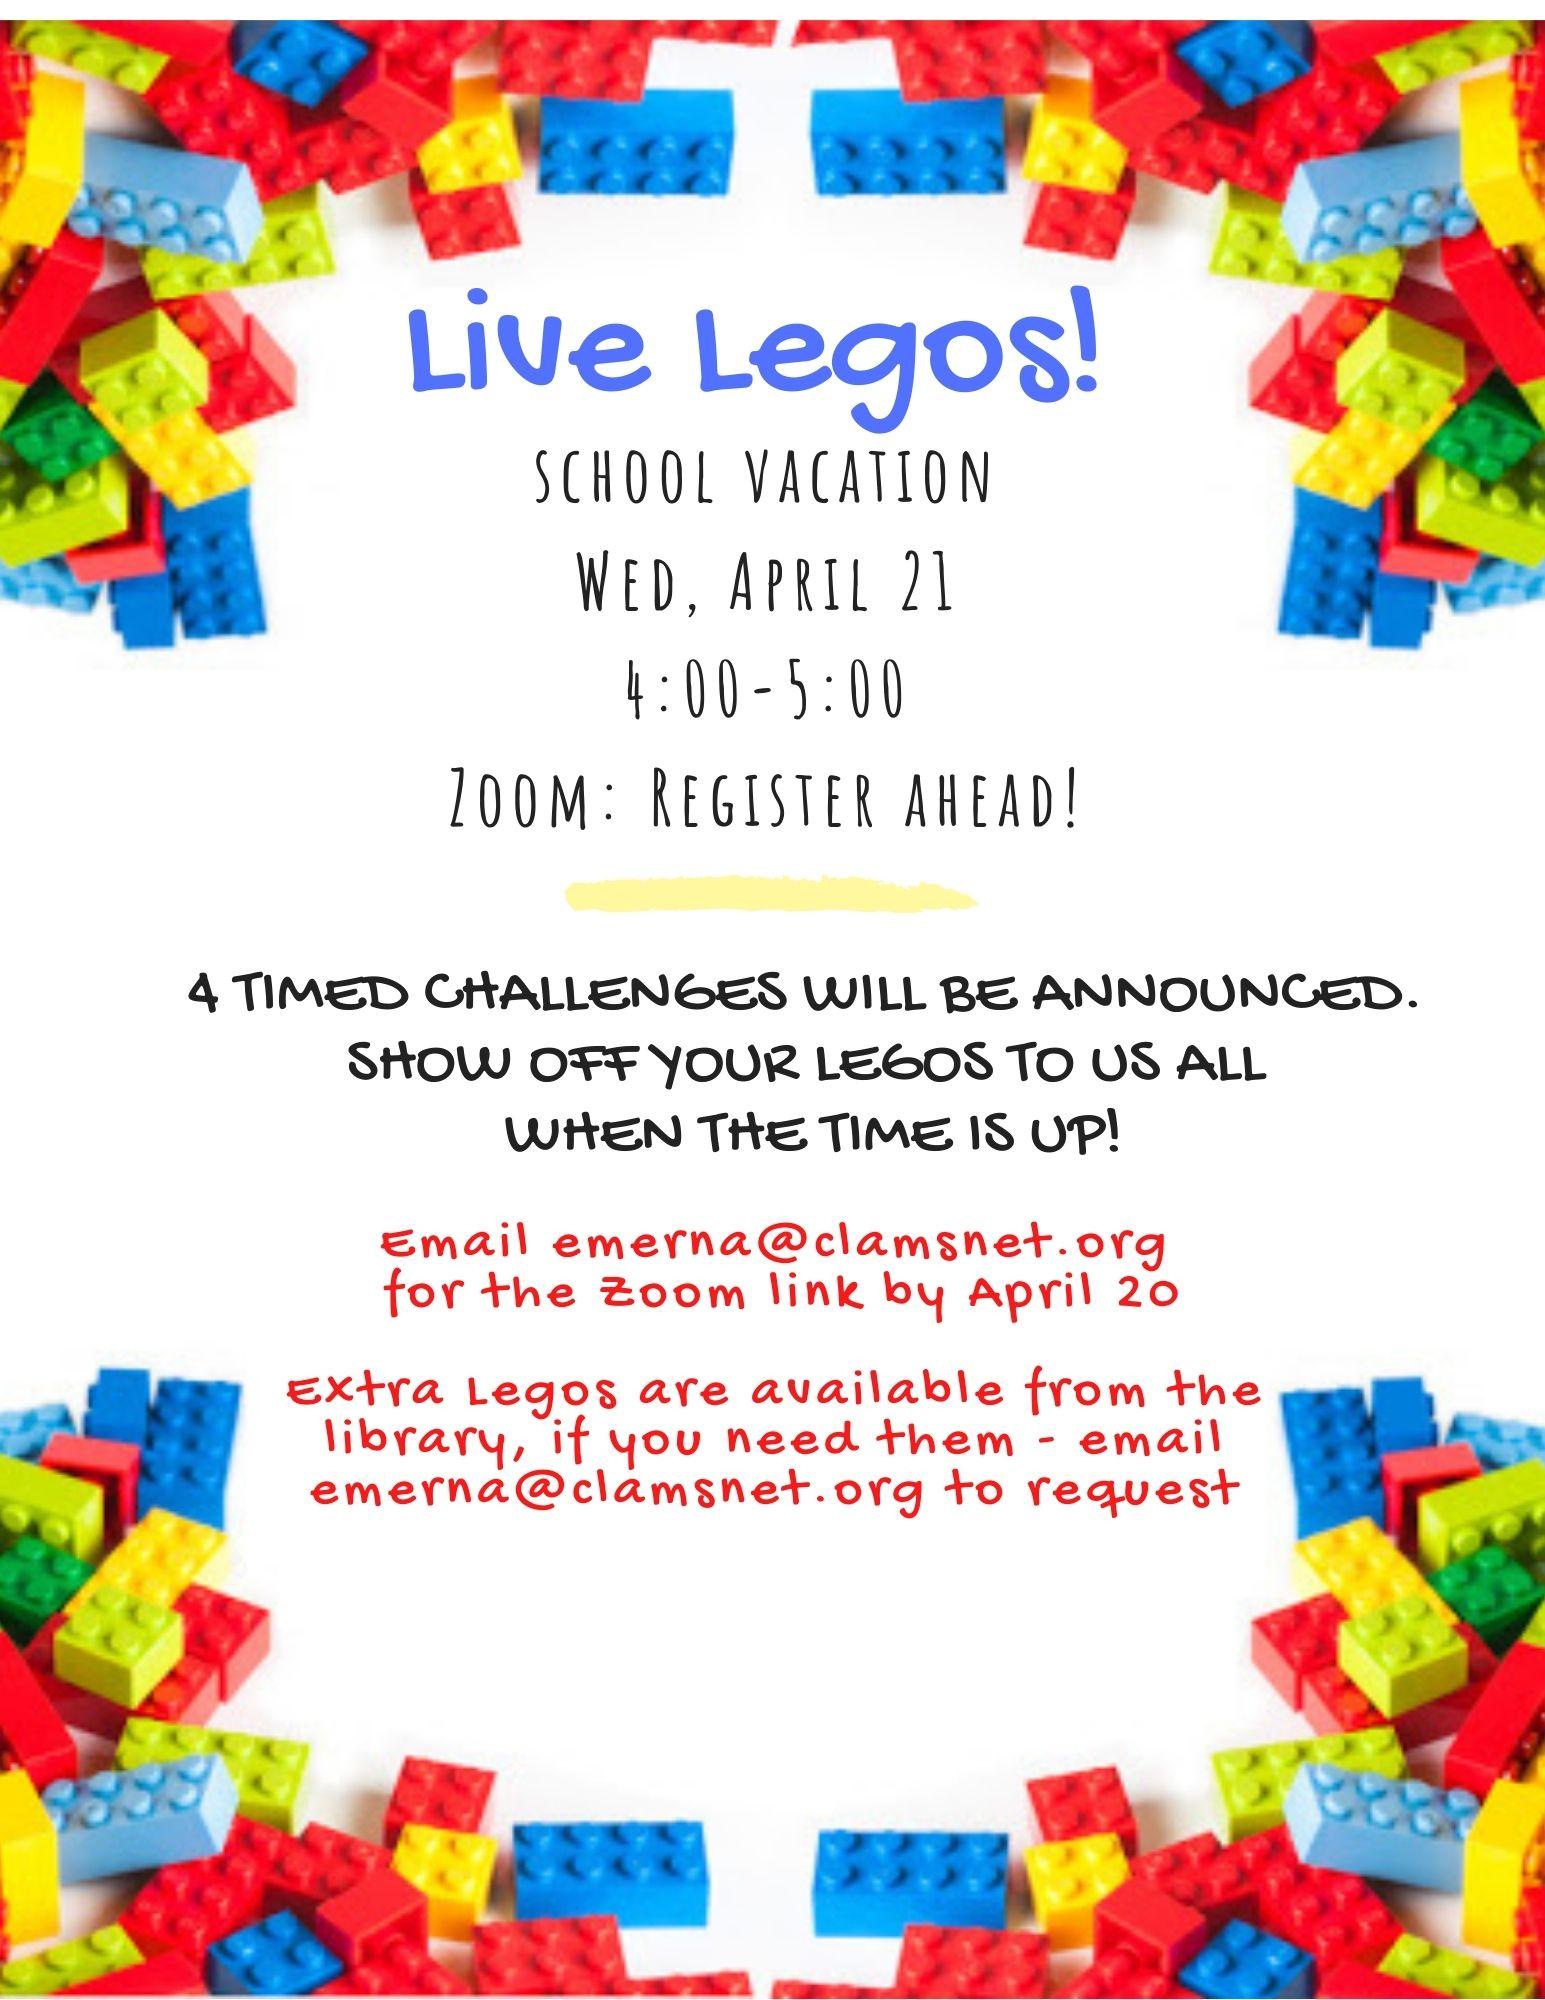 Live Legos!